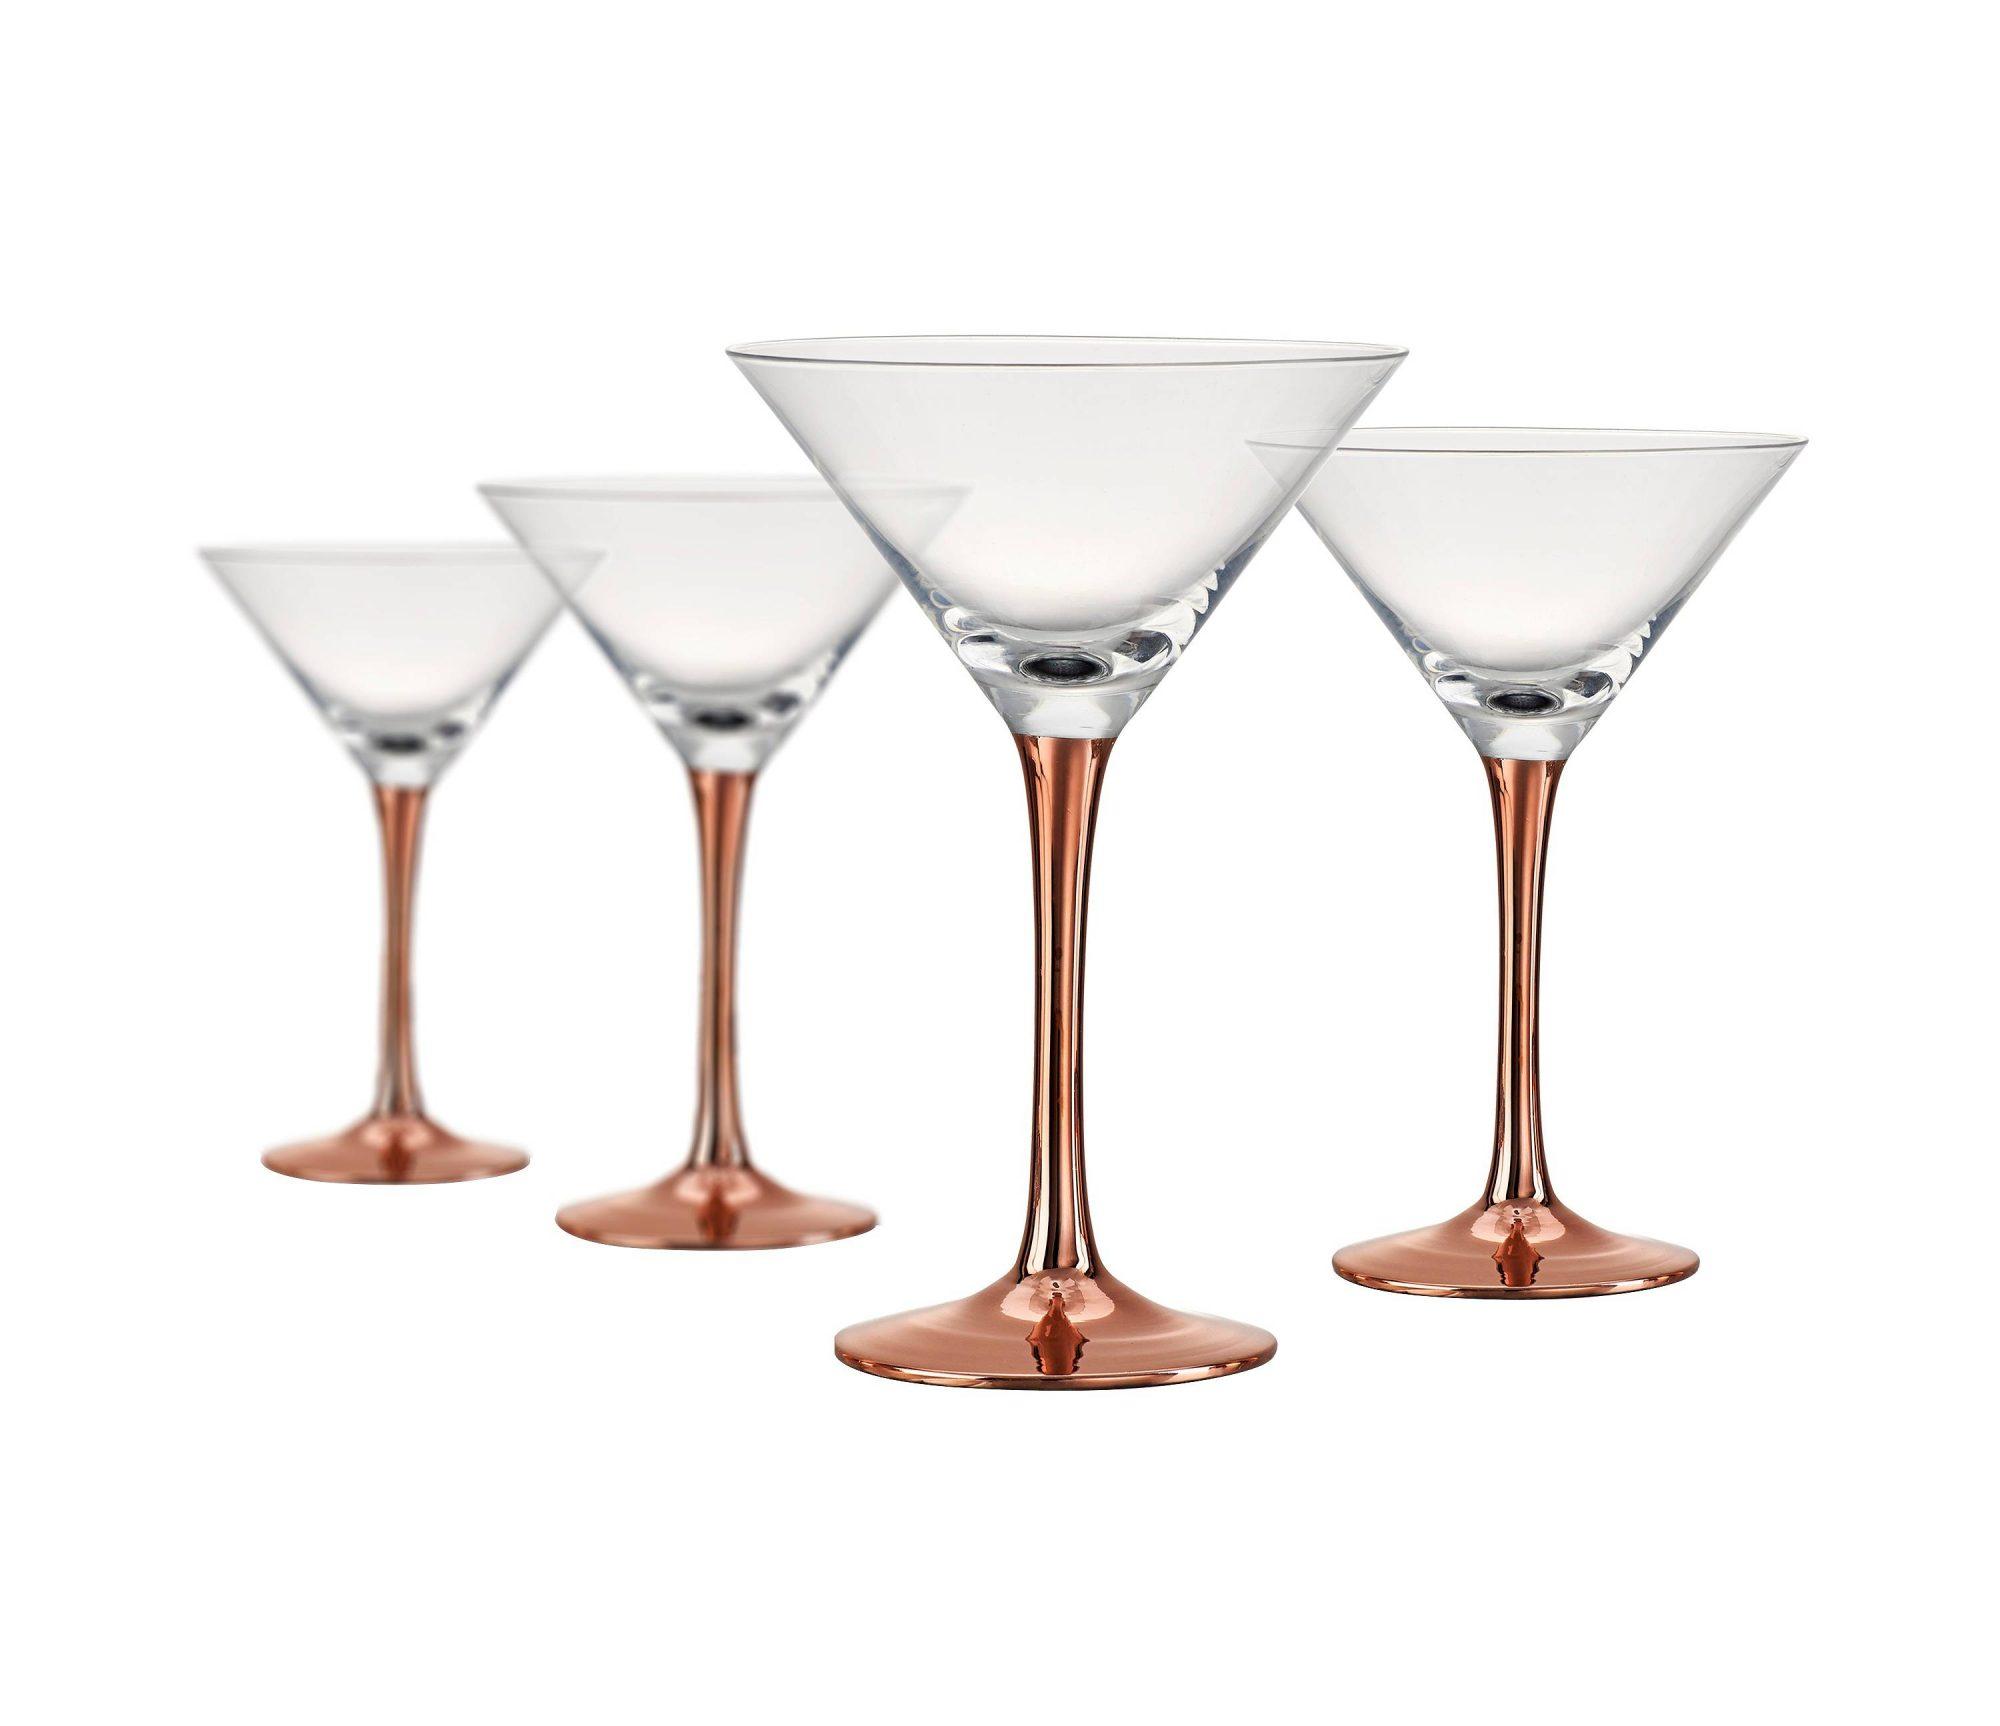 Coppertino-Martin-Glass-set-target.jpeg